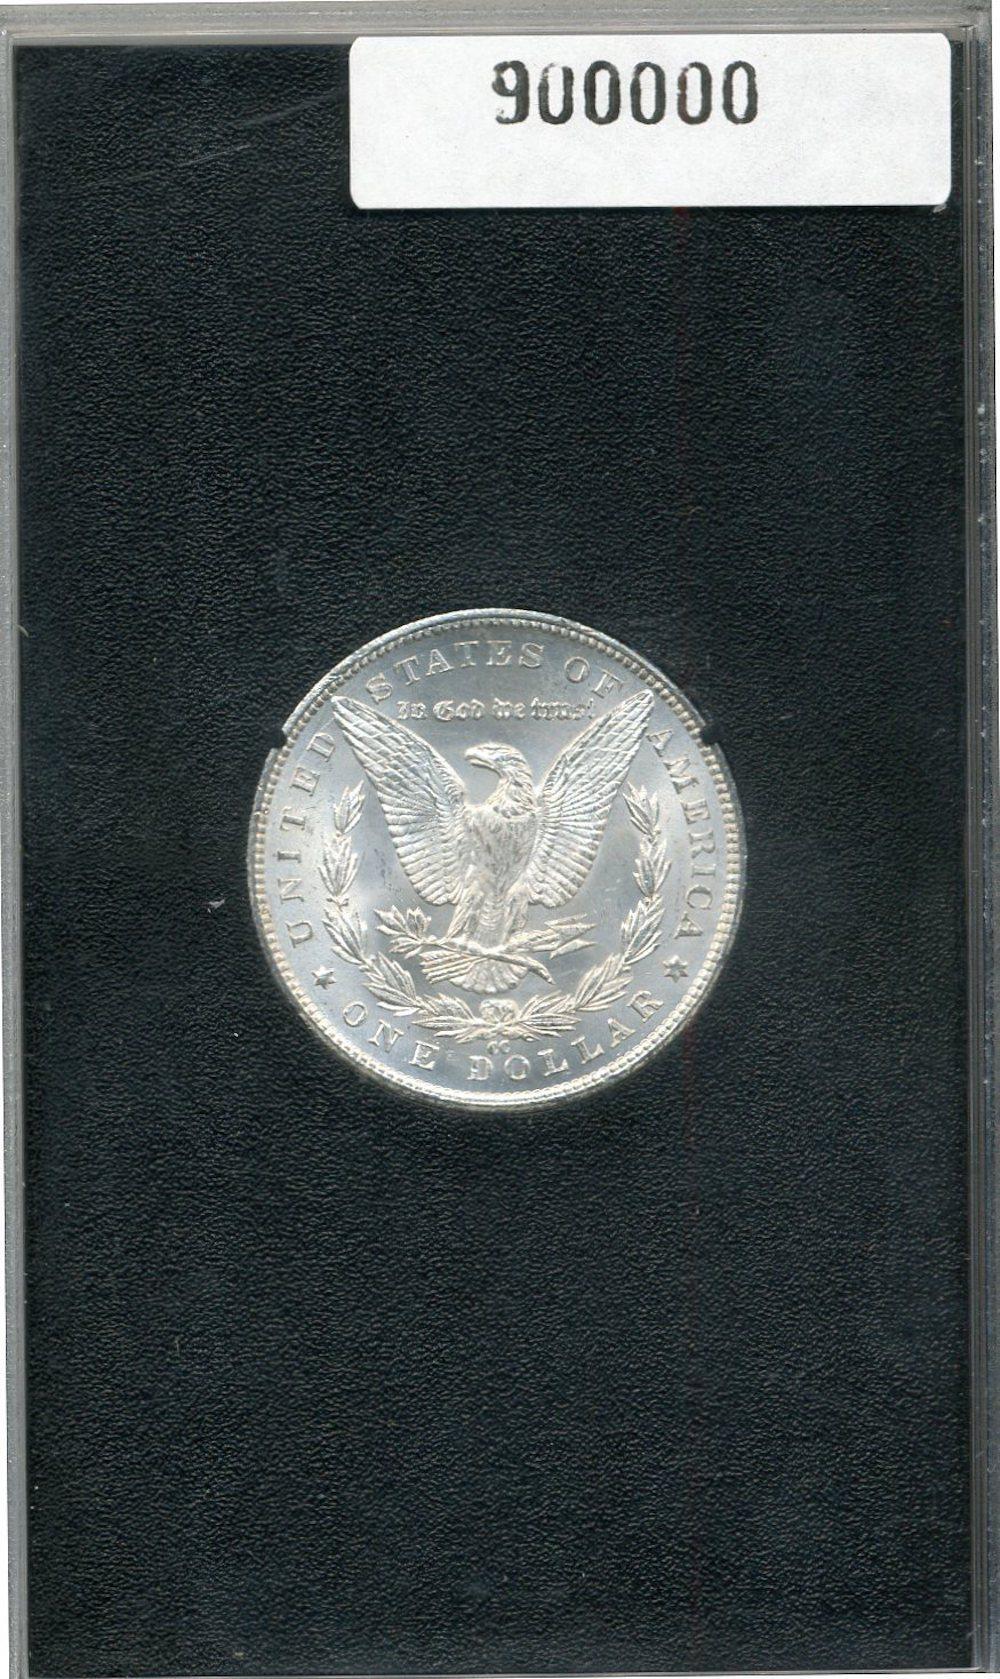 Original 1885-CC GSA Morgan Silver Dollar